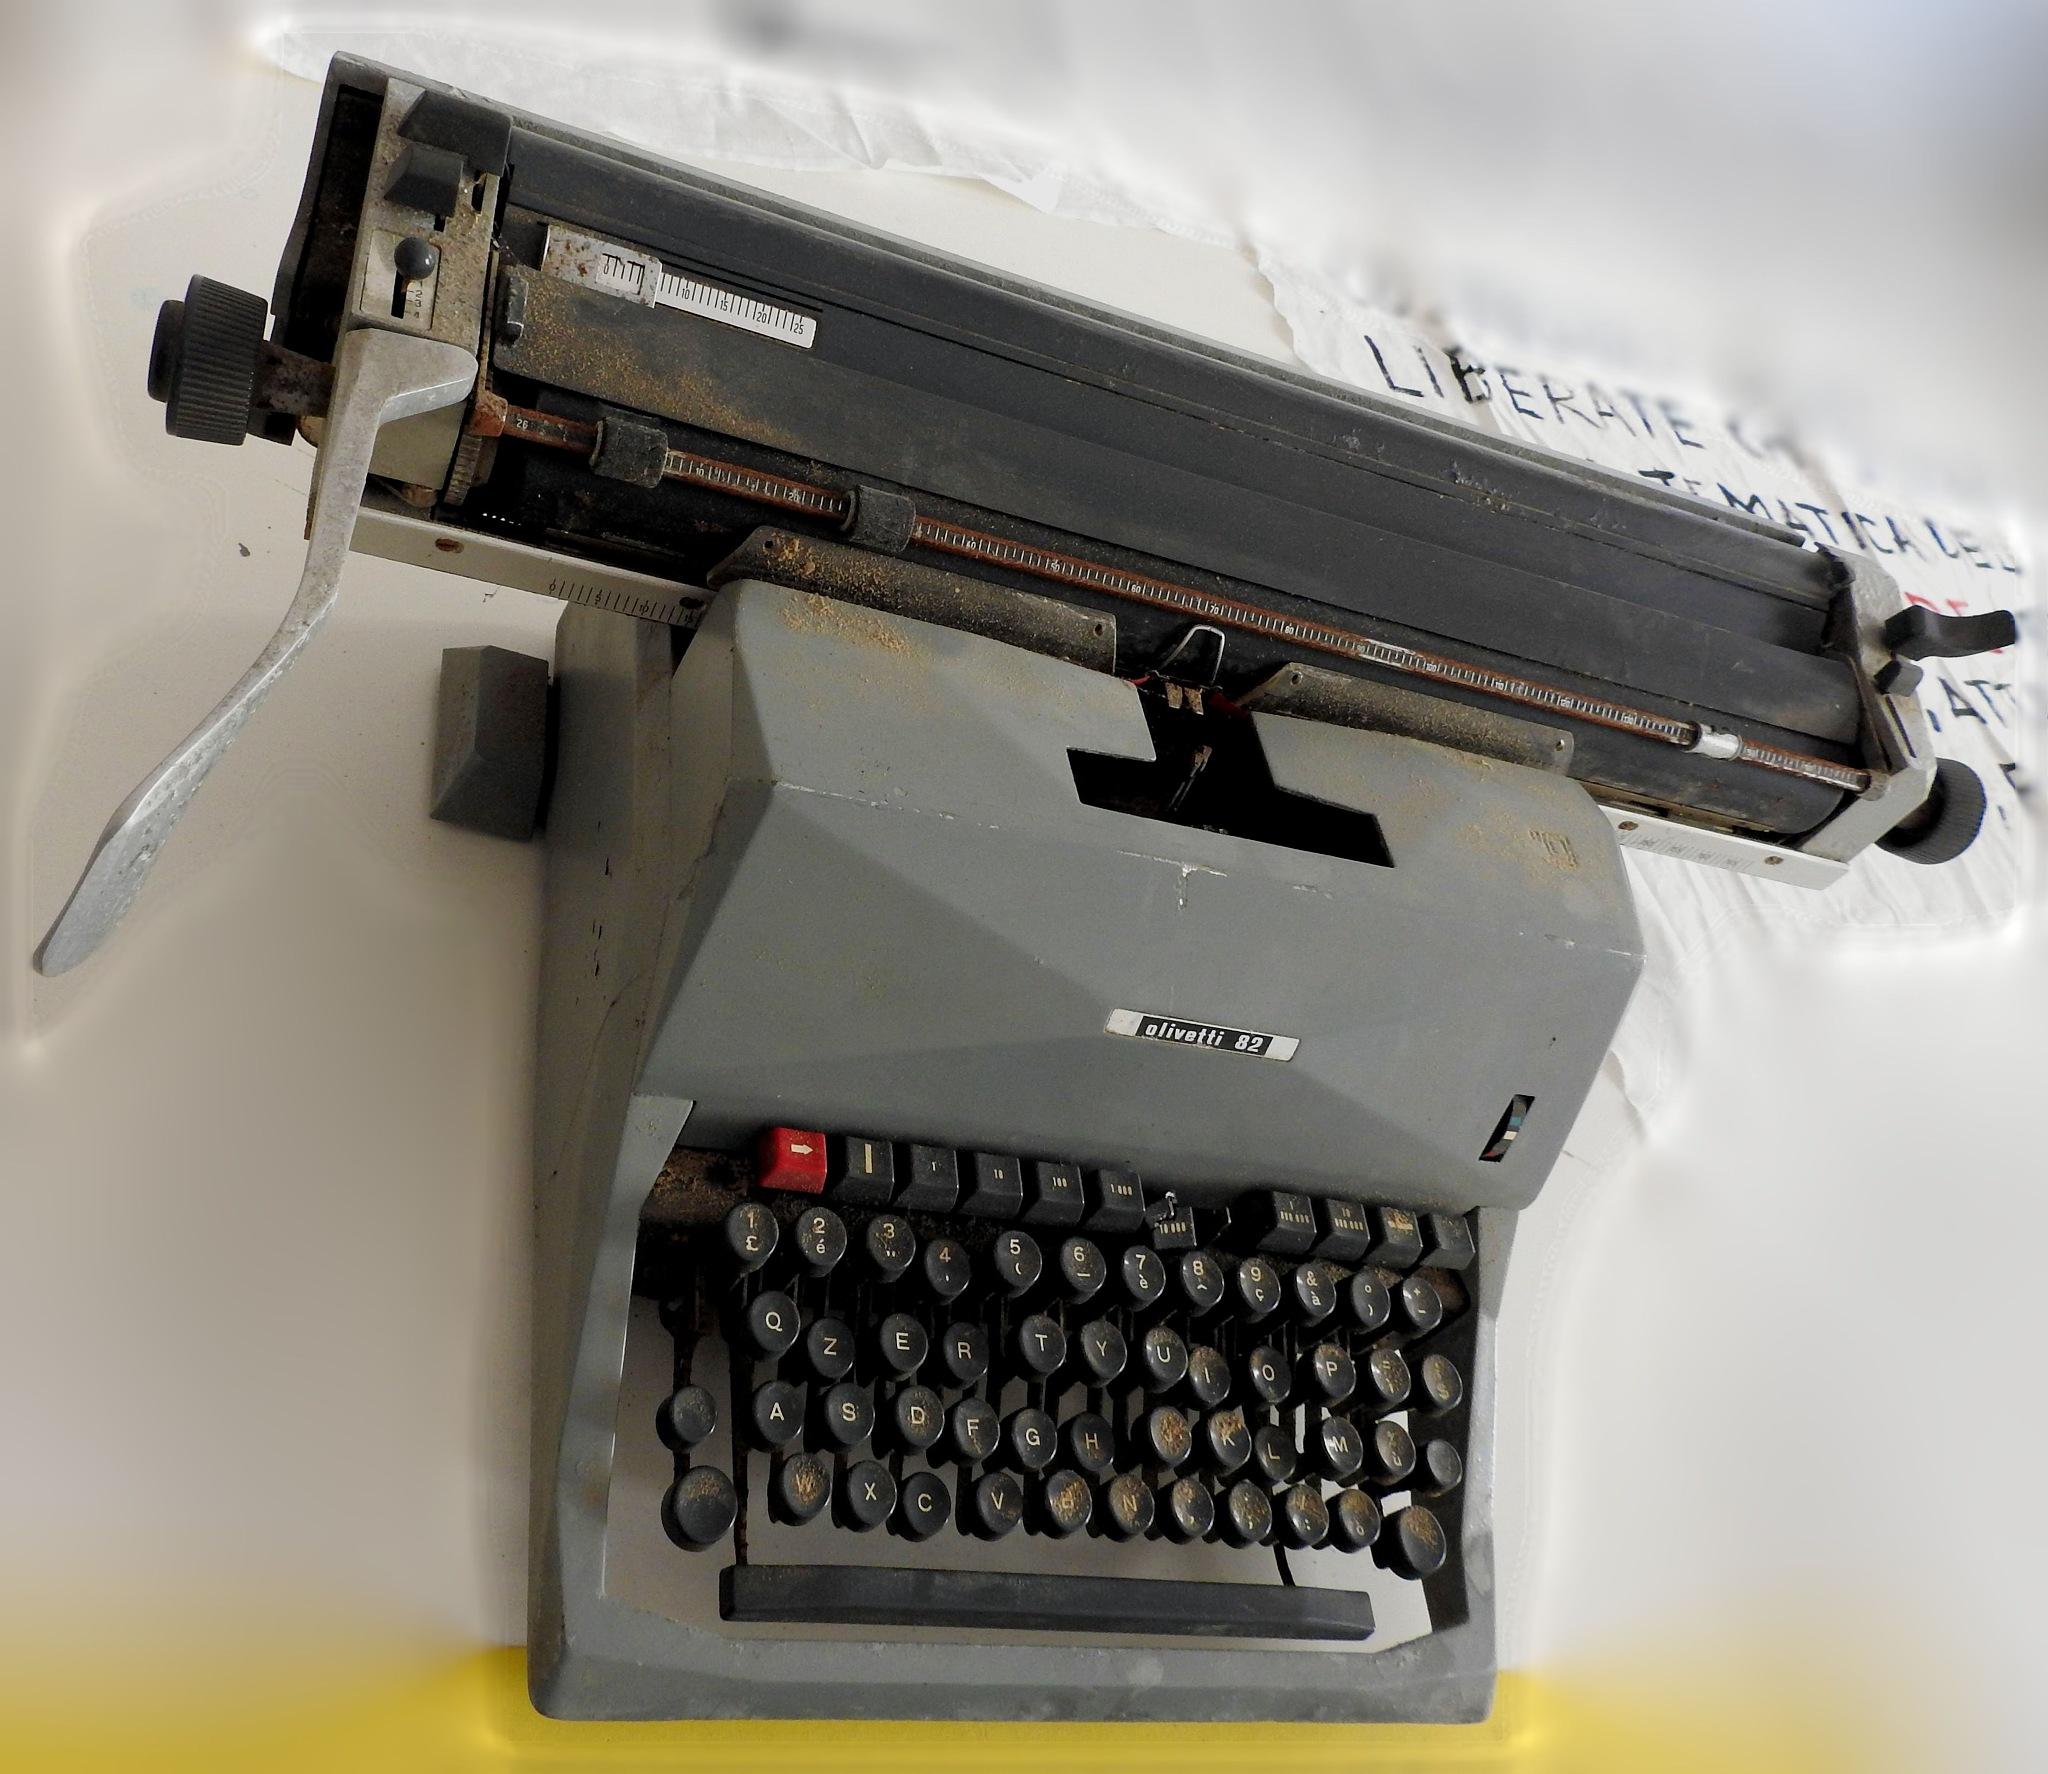 Olivetti 82 - Italian Typewriter by Delirium Tremends 62